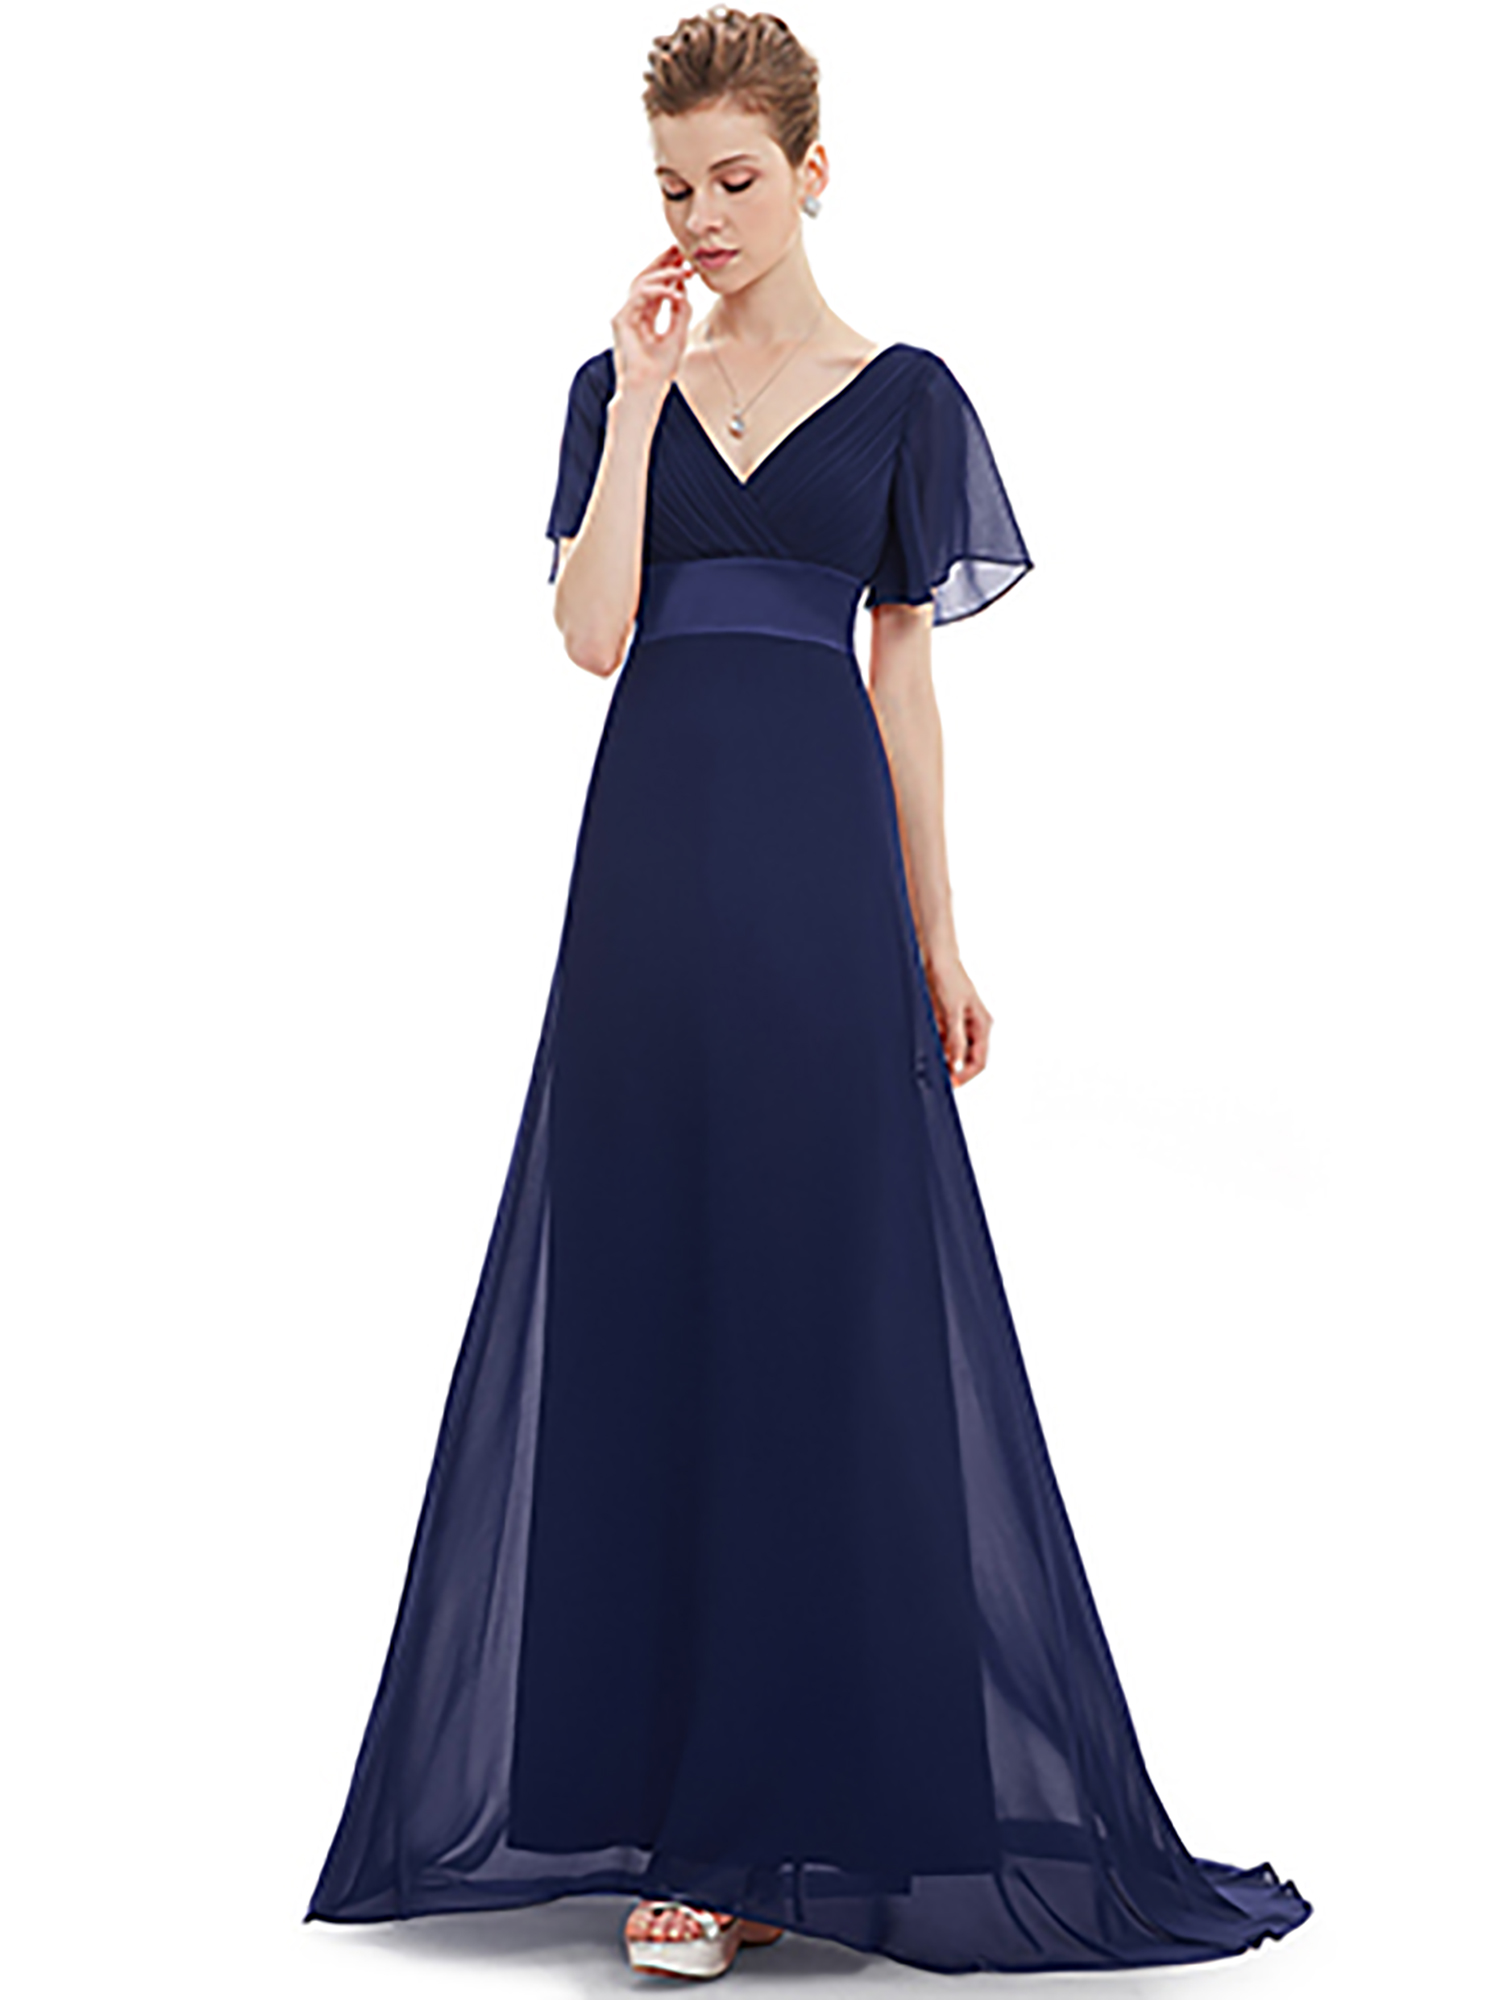 af46bcfb1292f Ever-pretty - Ever-Pretty Womens Flowy Chiffon Empire Waist Plus Size Long  Evening Party Maxi Dresses for Women 98903 Black US20 - Walmart.com